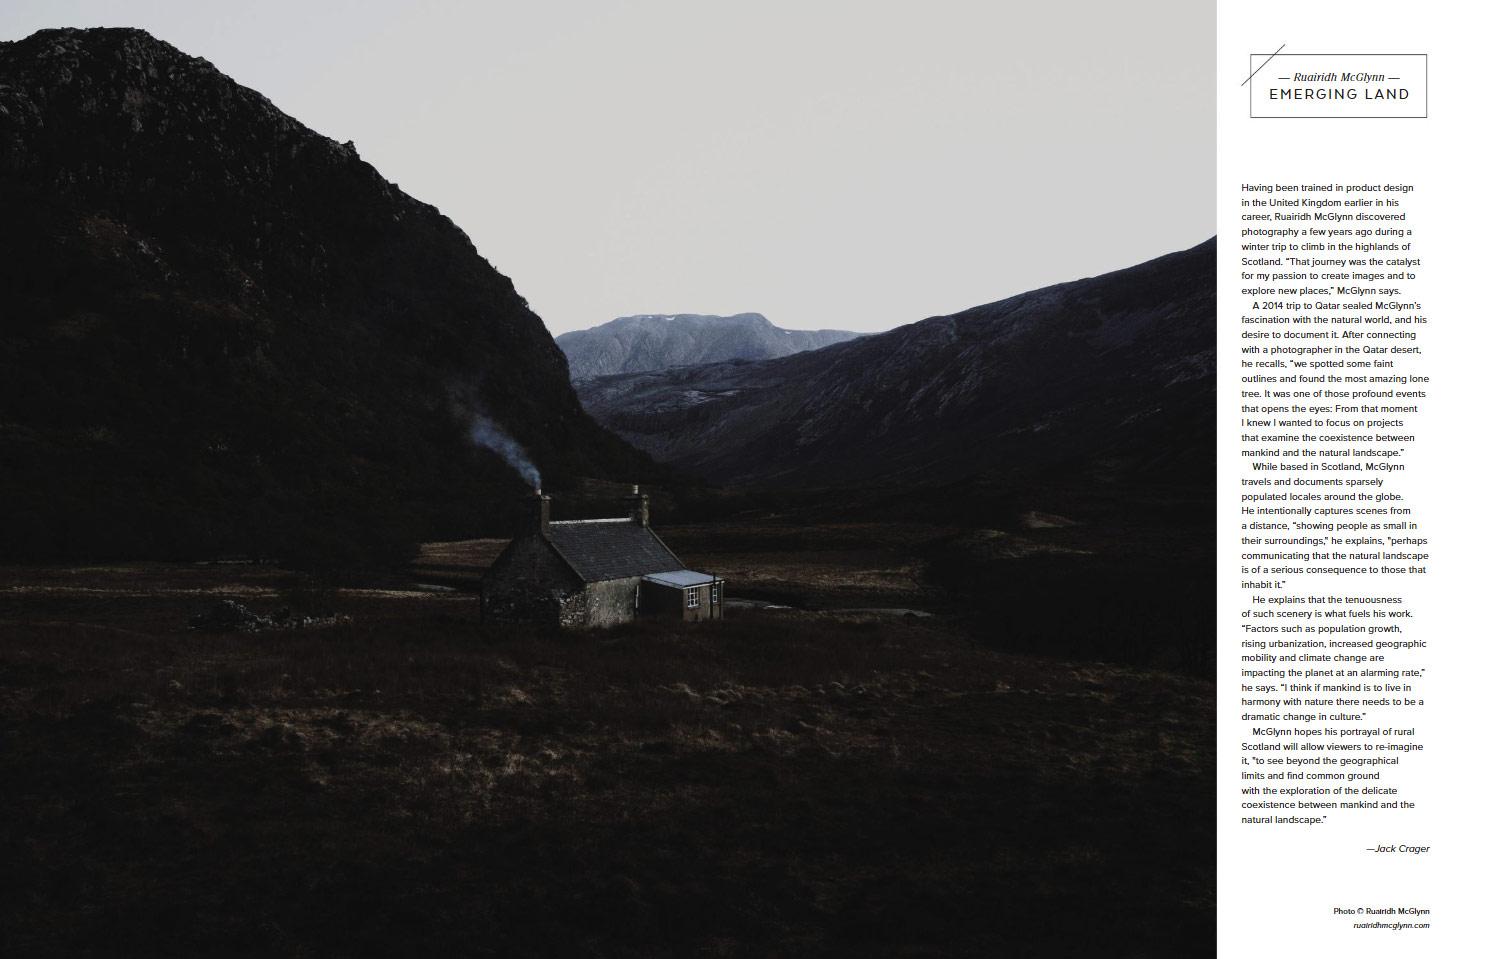 Emerging Land, © Ruairidh McGlynn, Emerging Photographer Fall